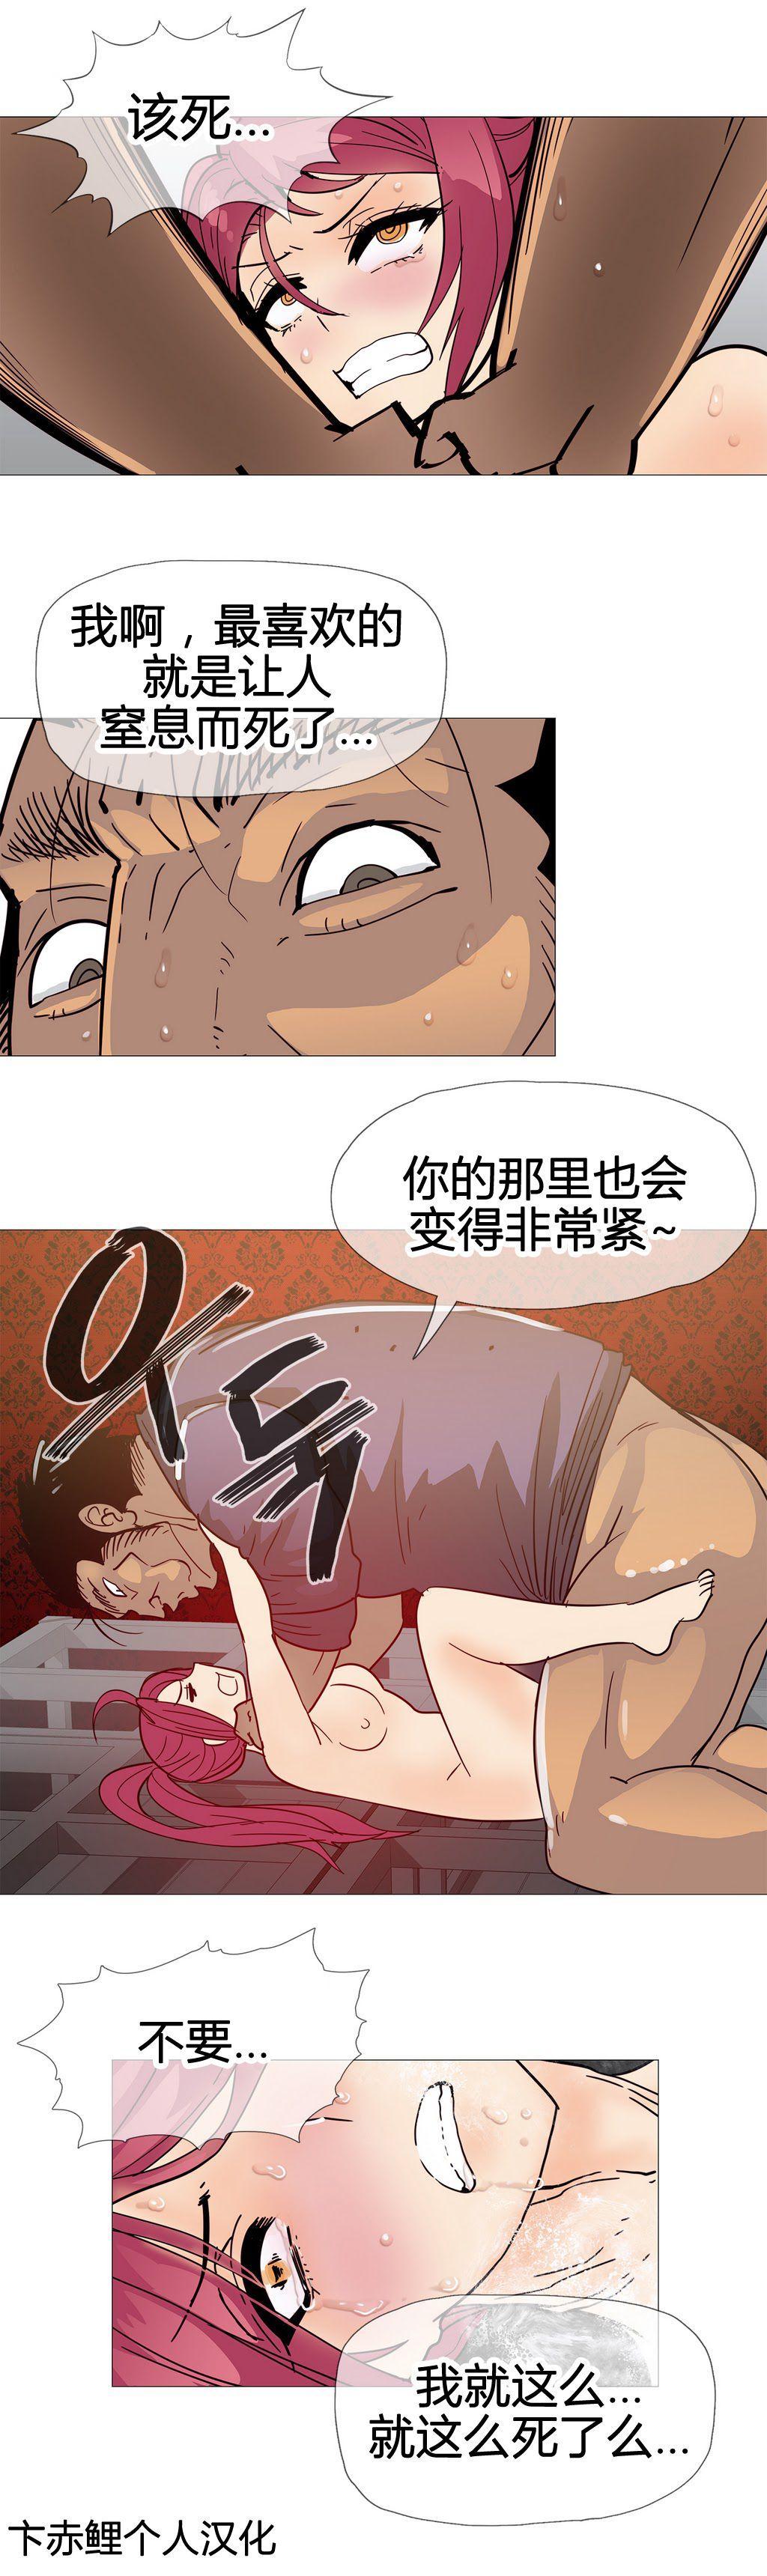 HouseHold Affairs 【卞赤鲤个人汉化】1~21话(持续更新中) 206